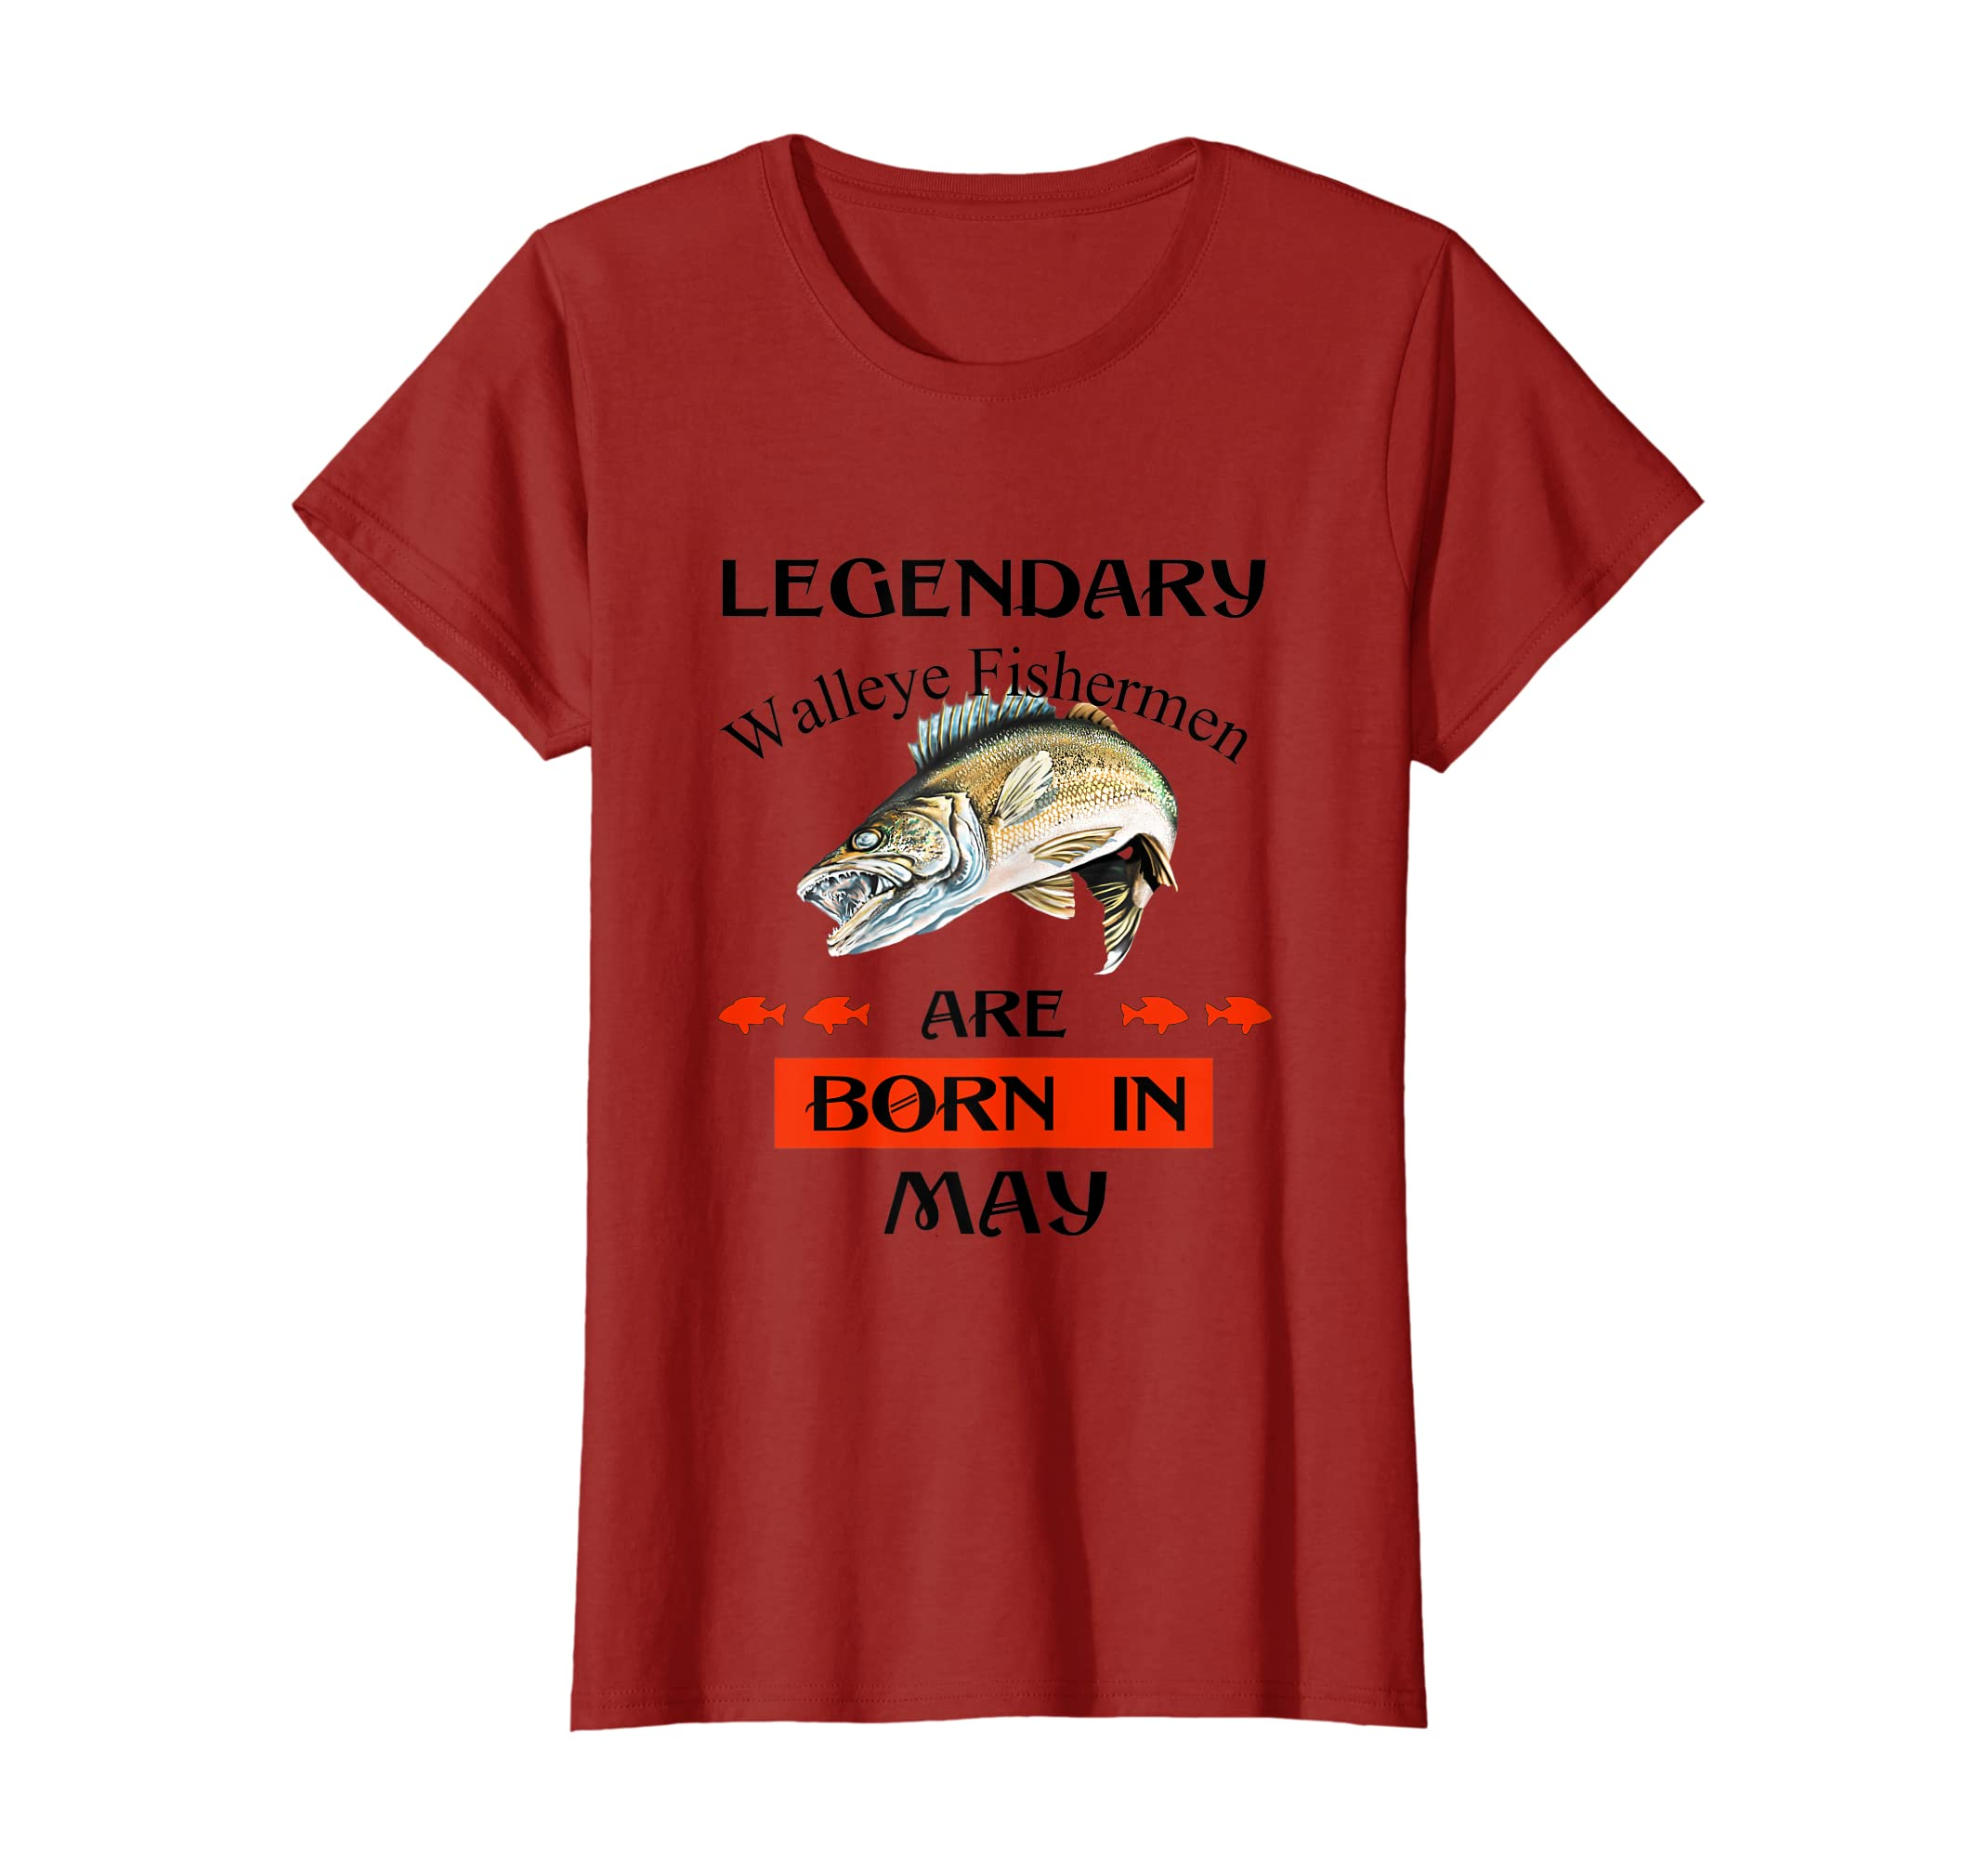 49c1f2395 Amazon.com: Legendary Walleye Fishermen Are Born in May T-Shirt: Clothing